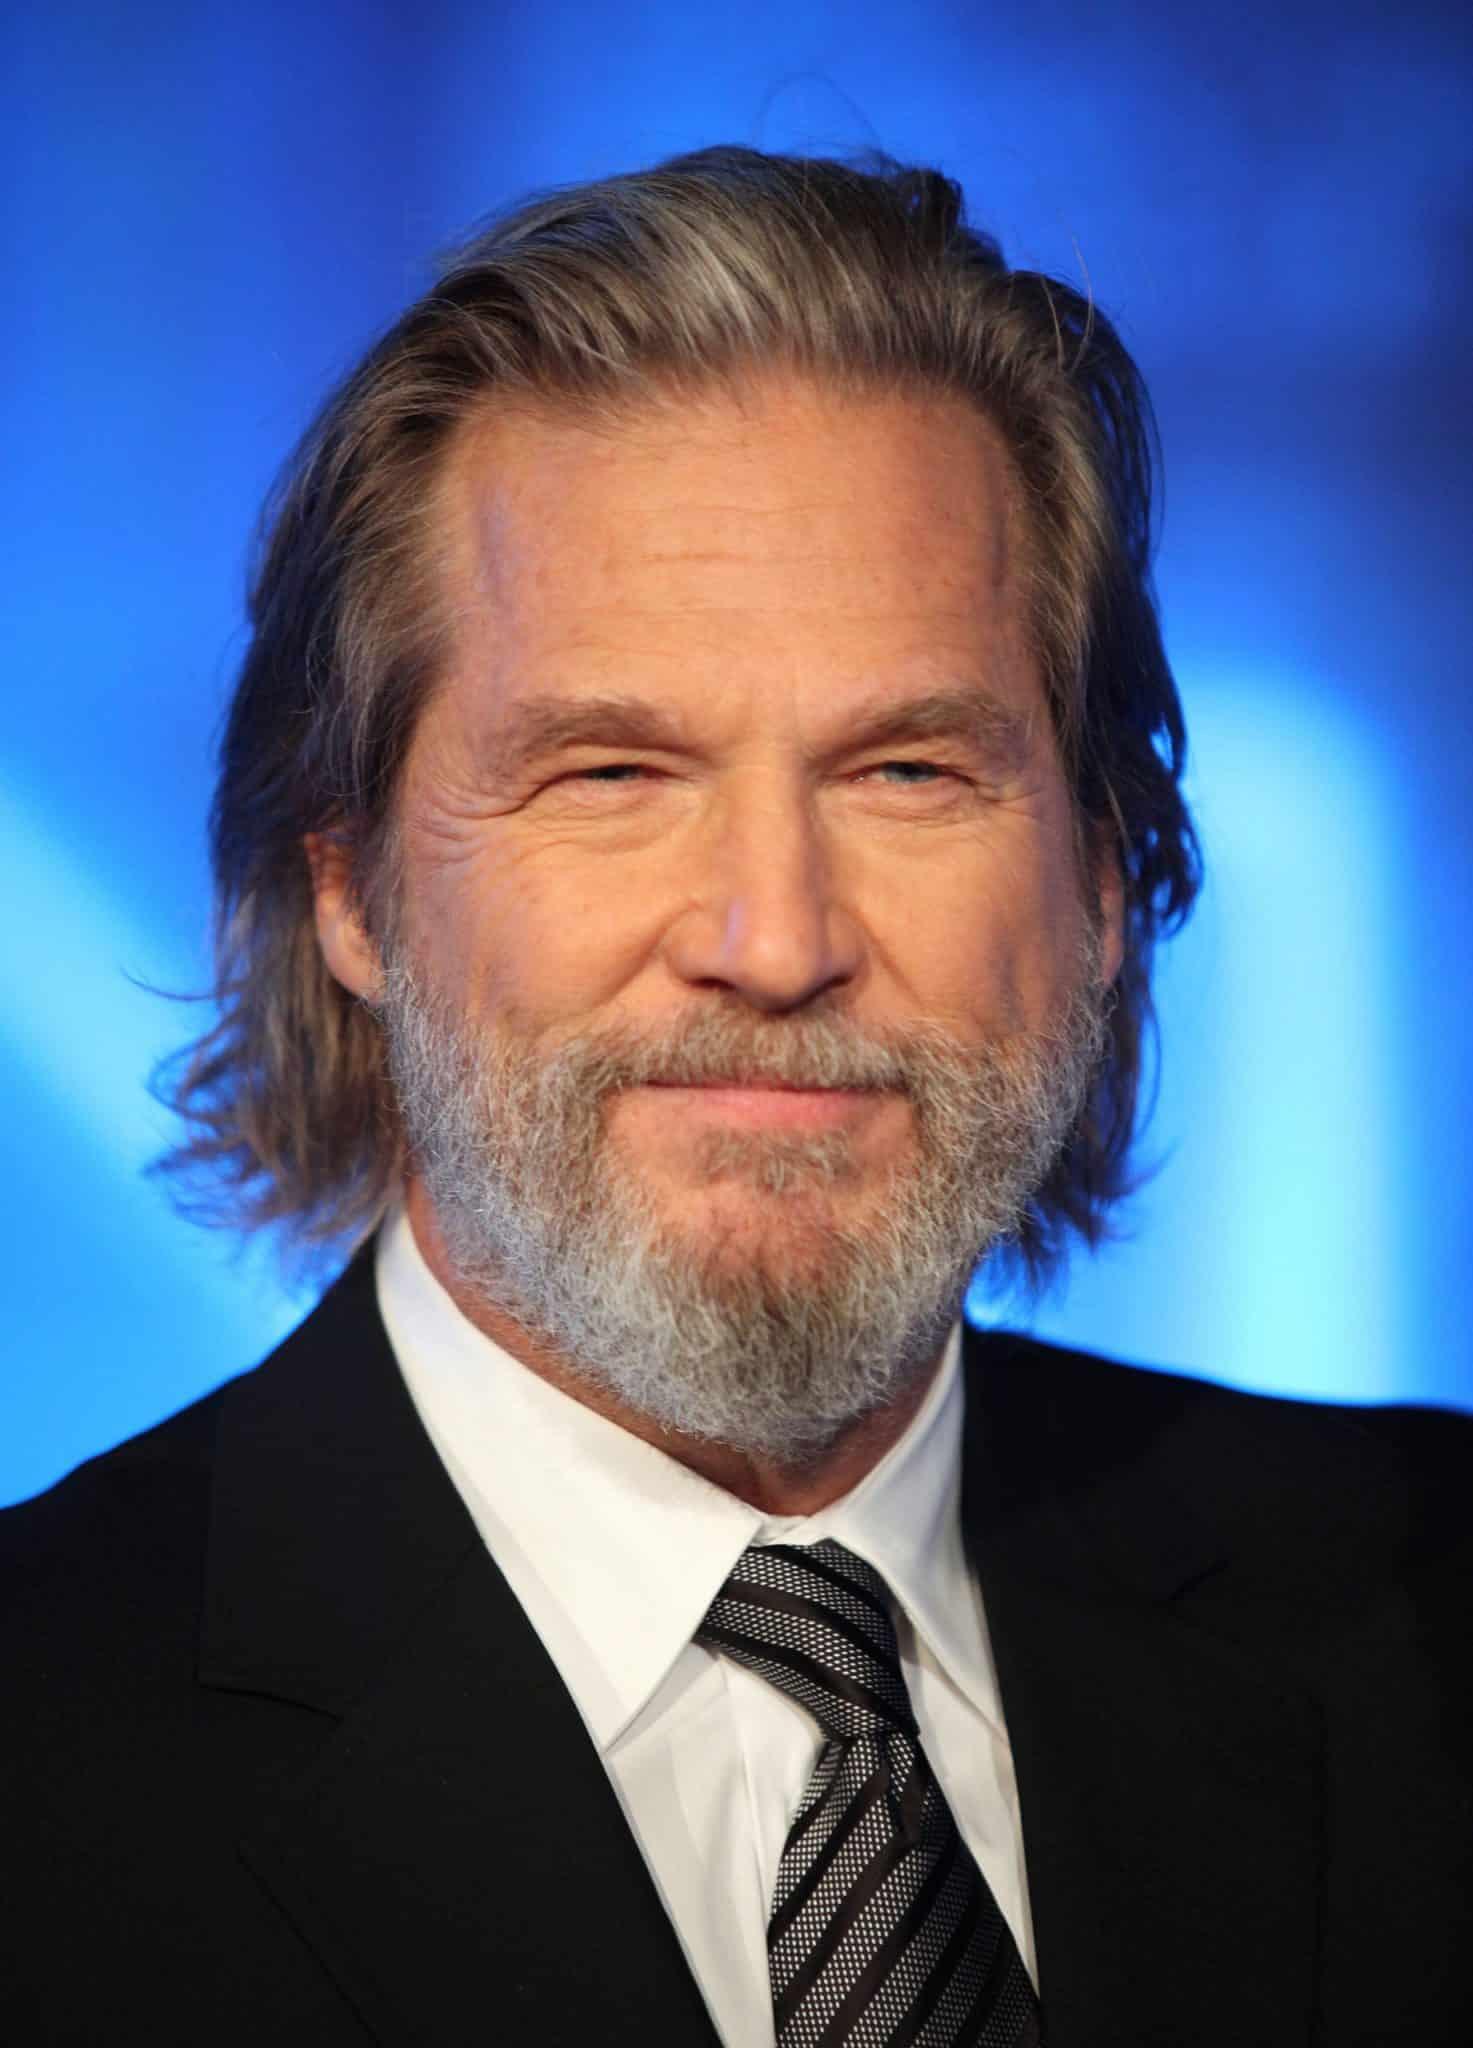 Jeff Bridges (Photo: DFree/Shutterstock.com)